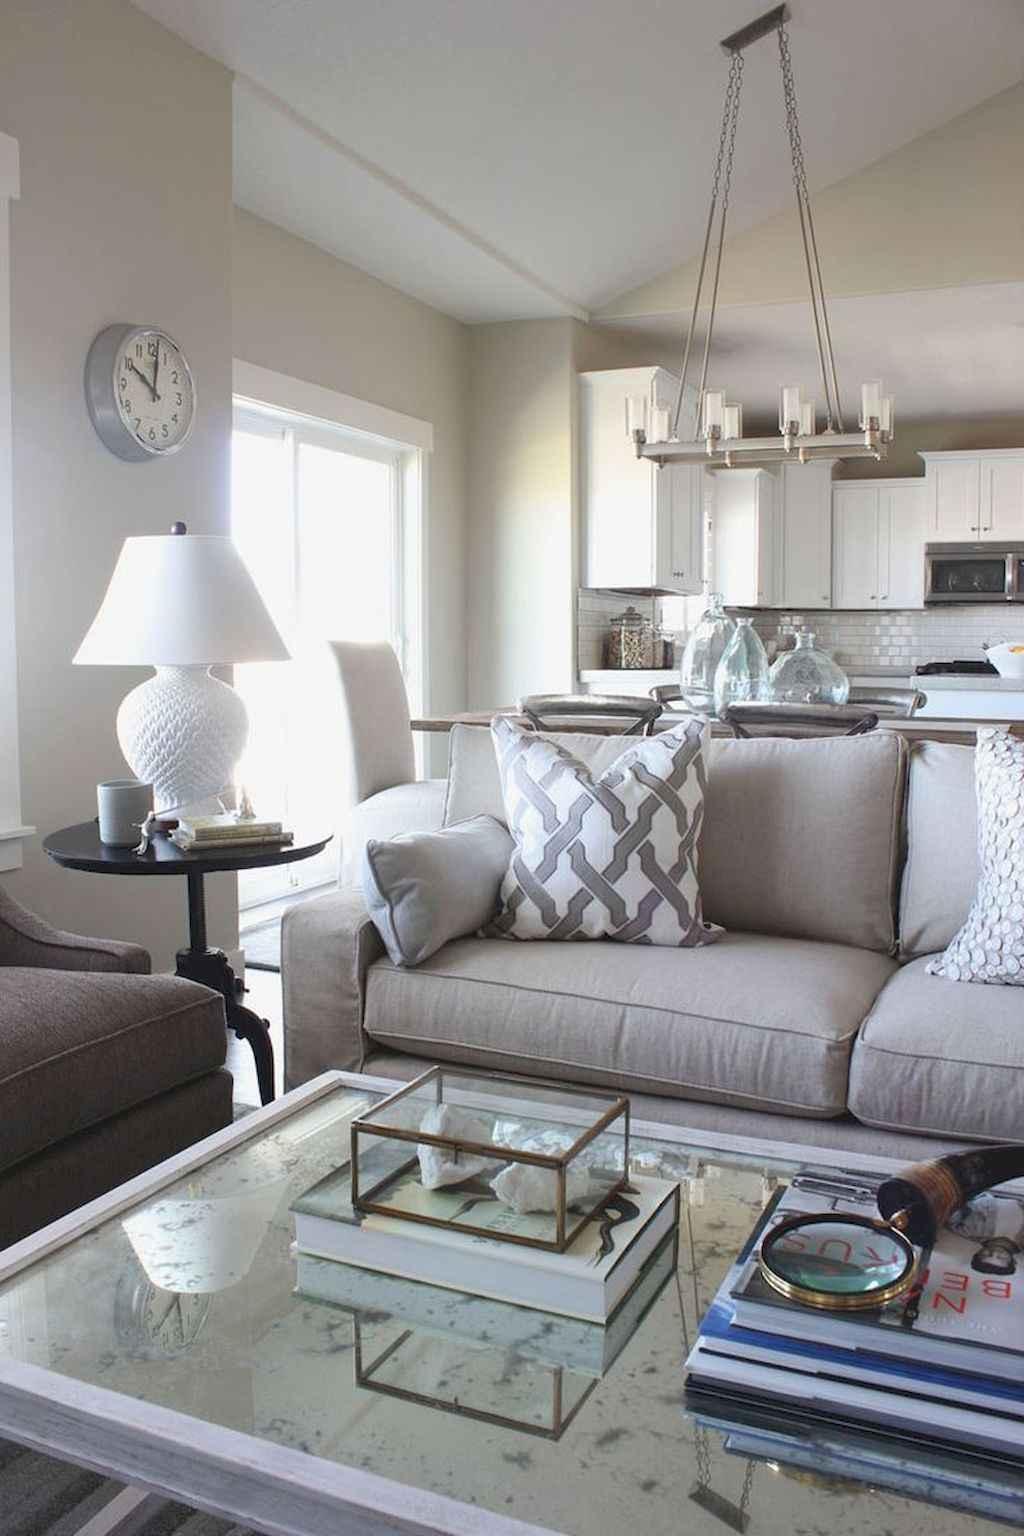 70 Rustic Farmhouse Living Room Decor Ideas (40)